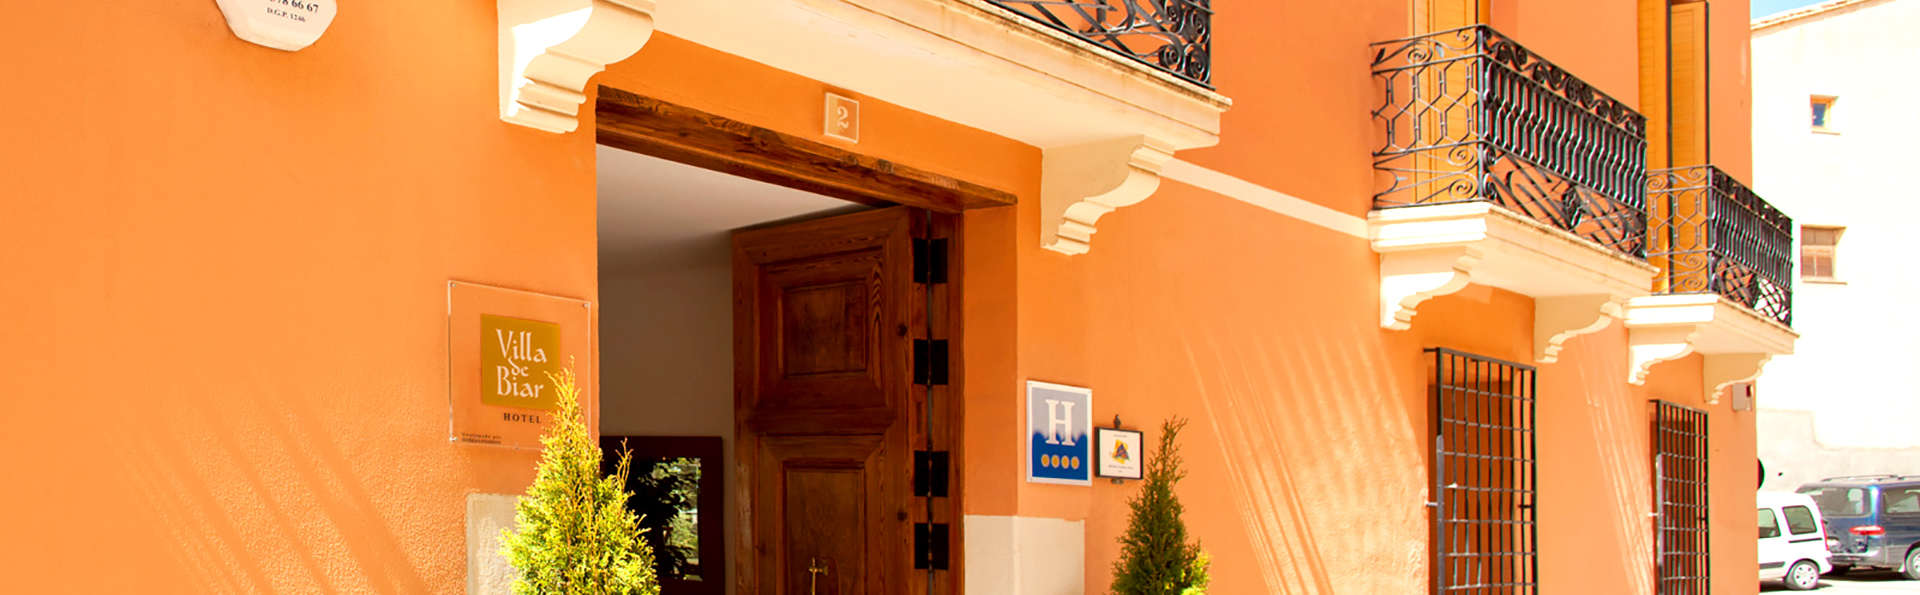 Hotel Villa de Biar - Edit_Front.jpg